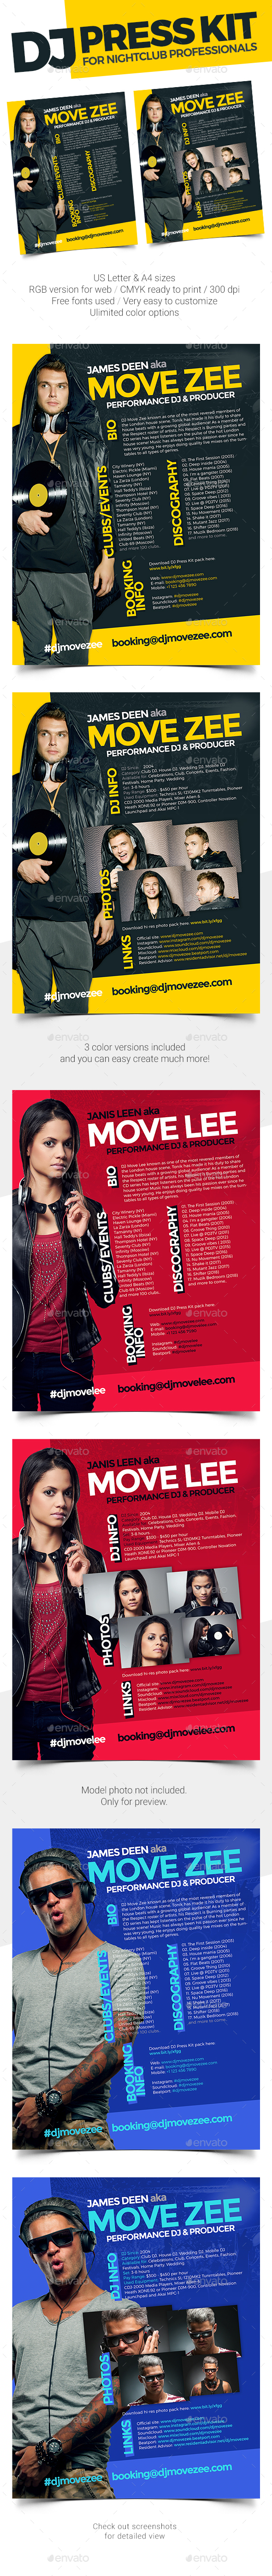 MoveDJ - DJ Press Kit / DJ Resume / DJ Rider PSD Template